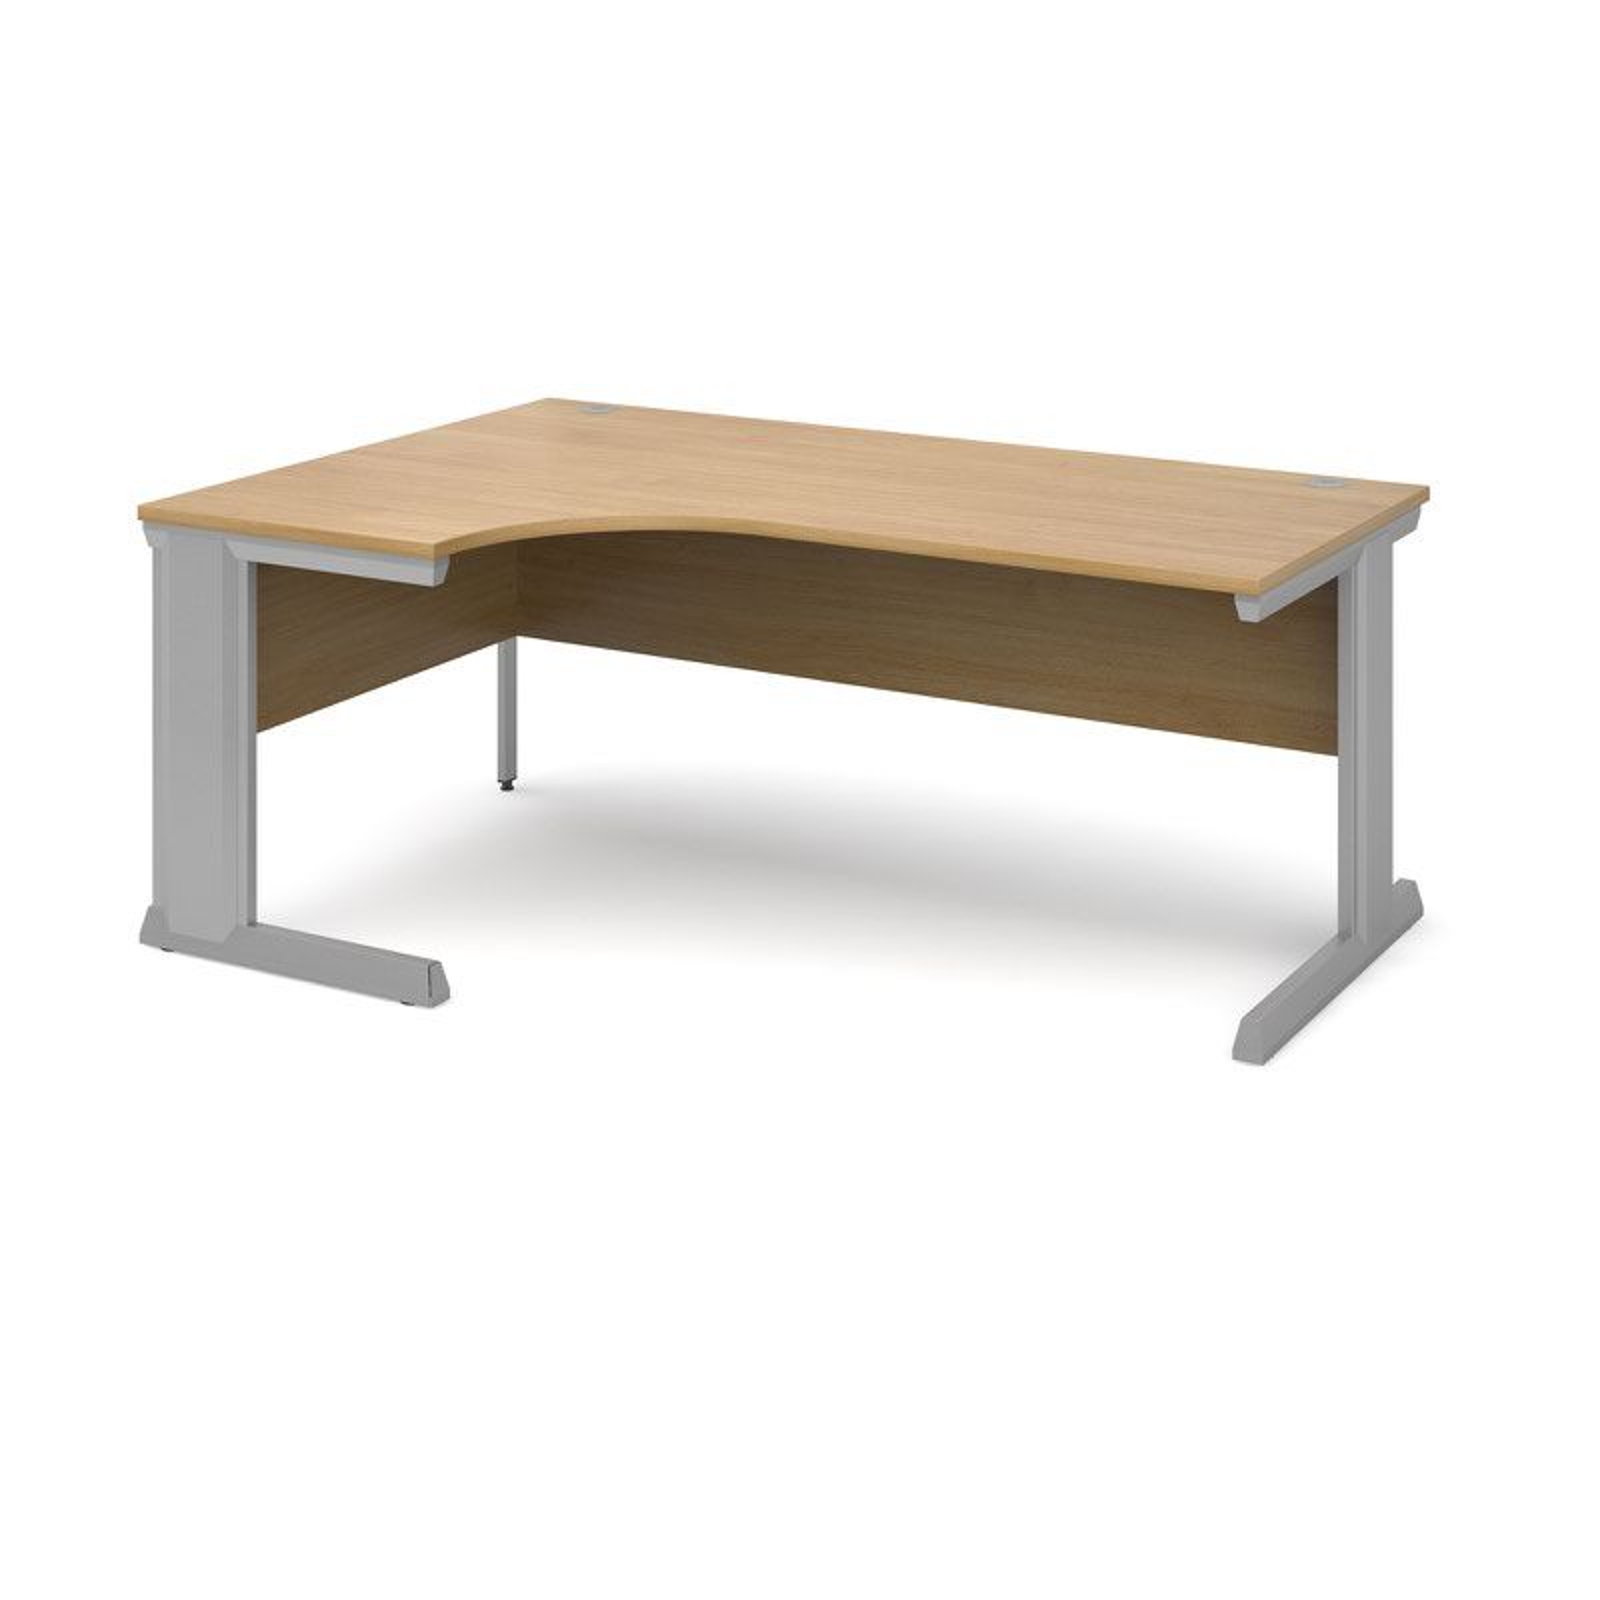 Compare prices for Vivo Left Hand Ergonomic Desk 1800mm - Silver Frame Oak Top